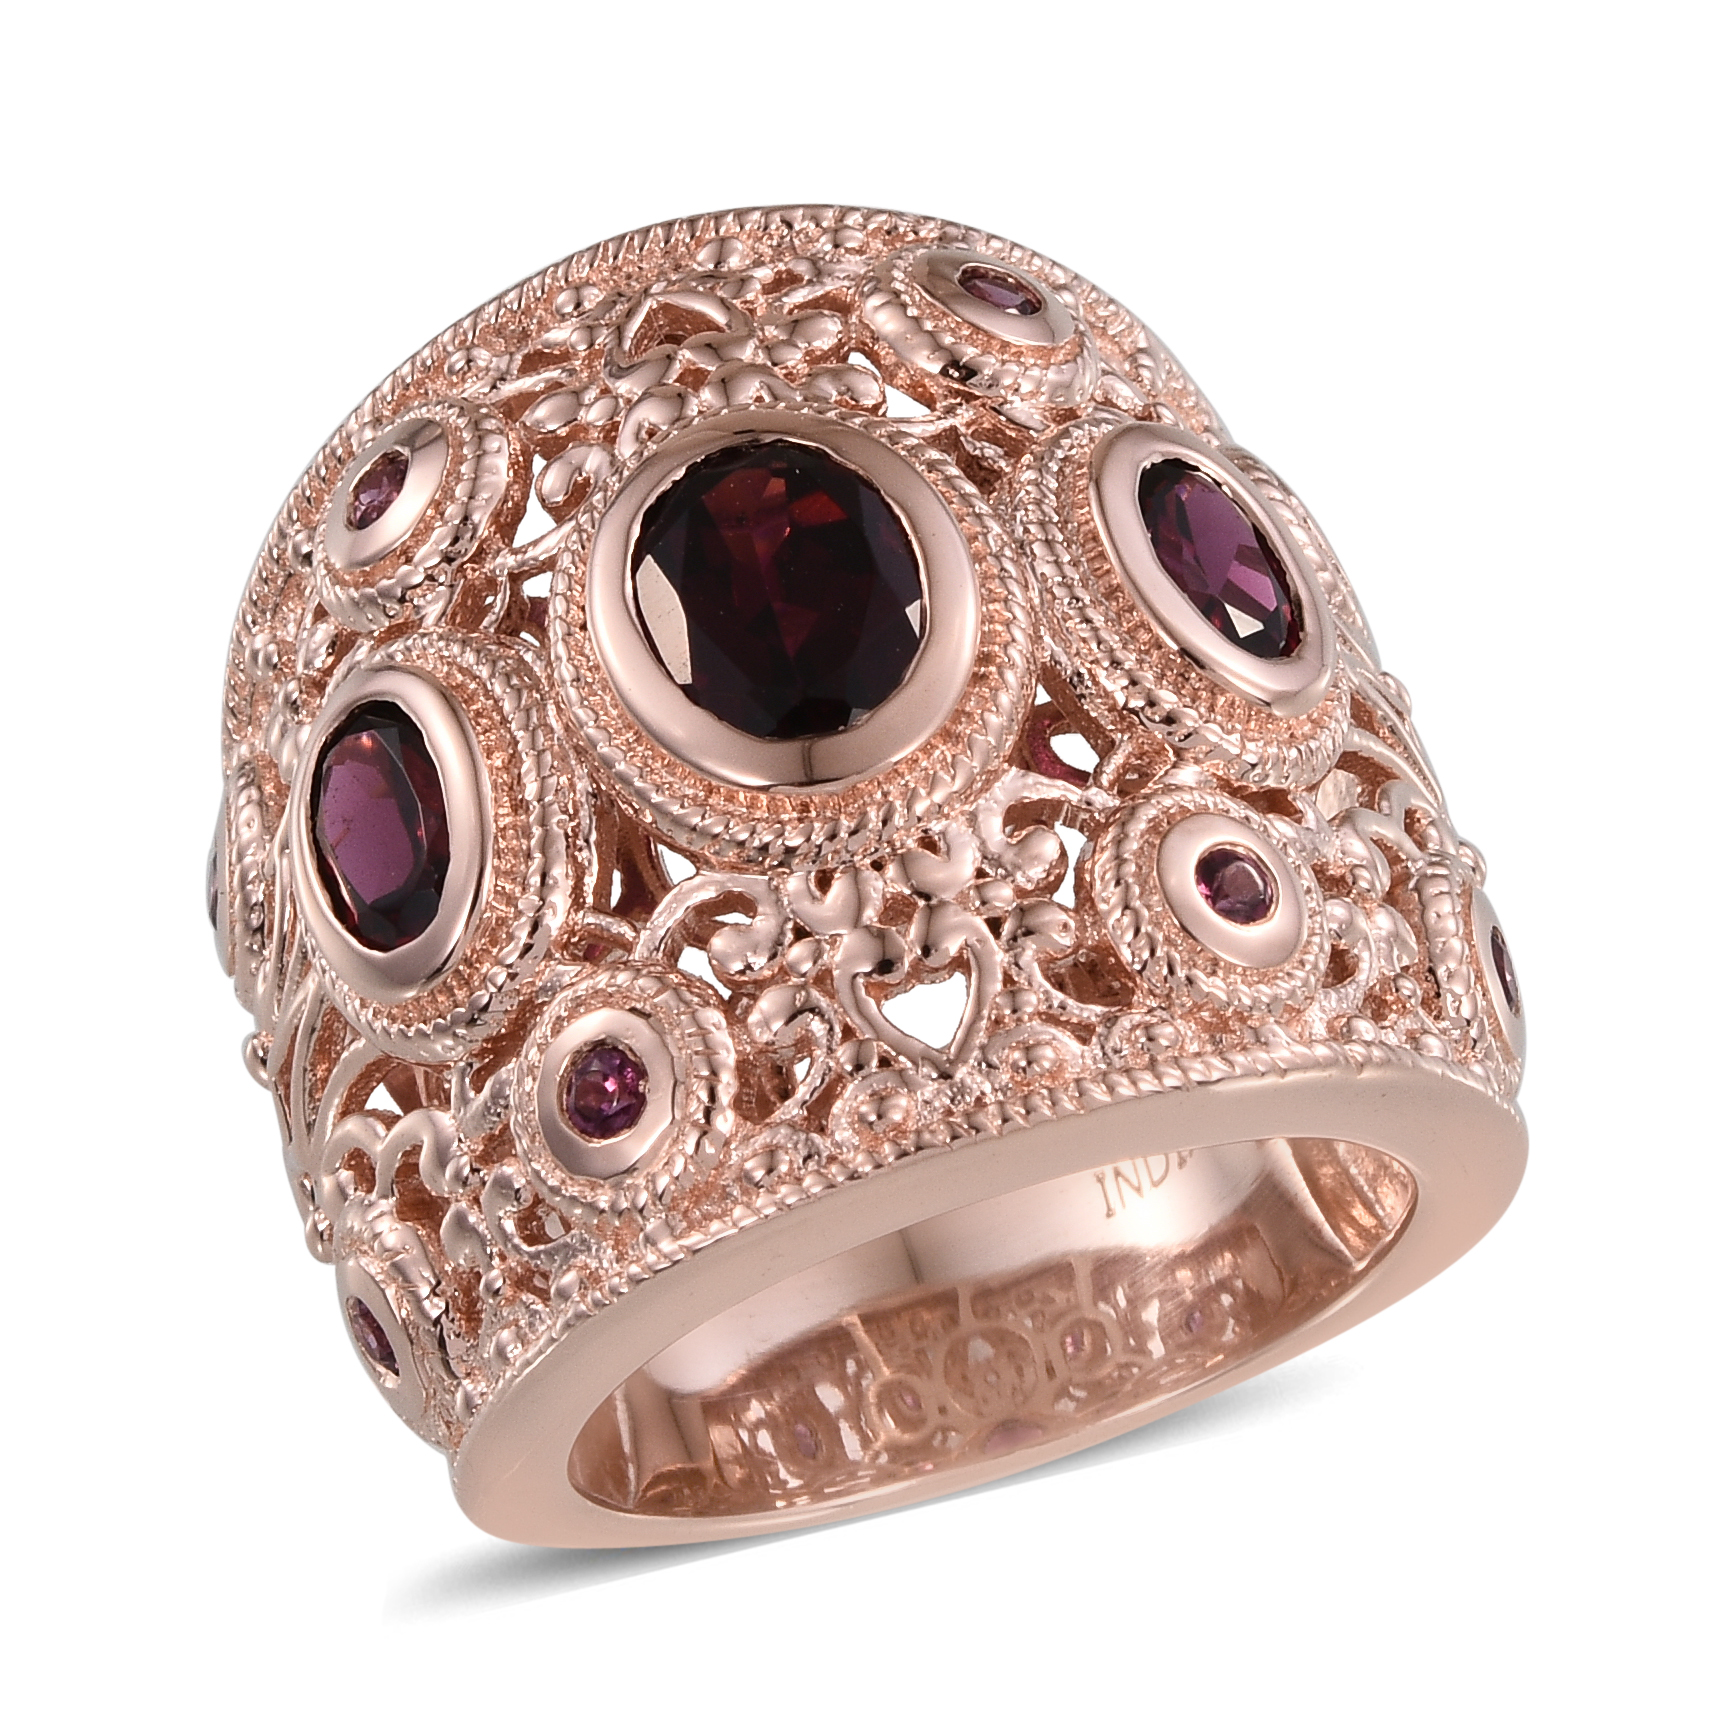 Rhodolite-Garnet-Rose-Gold-Over-925-Sterling-Silver-Cluster-Anniversary-Ring